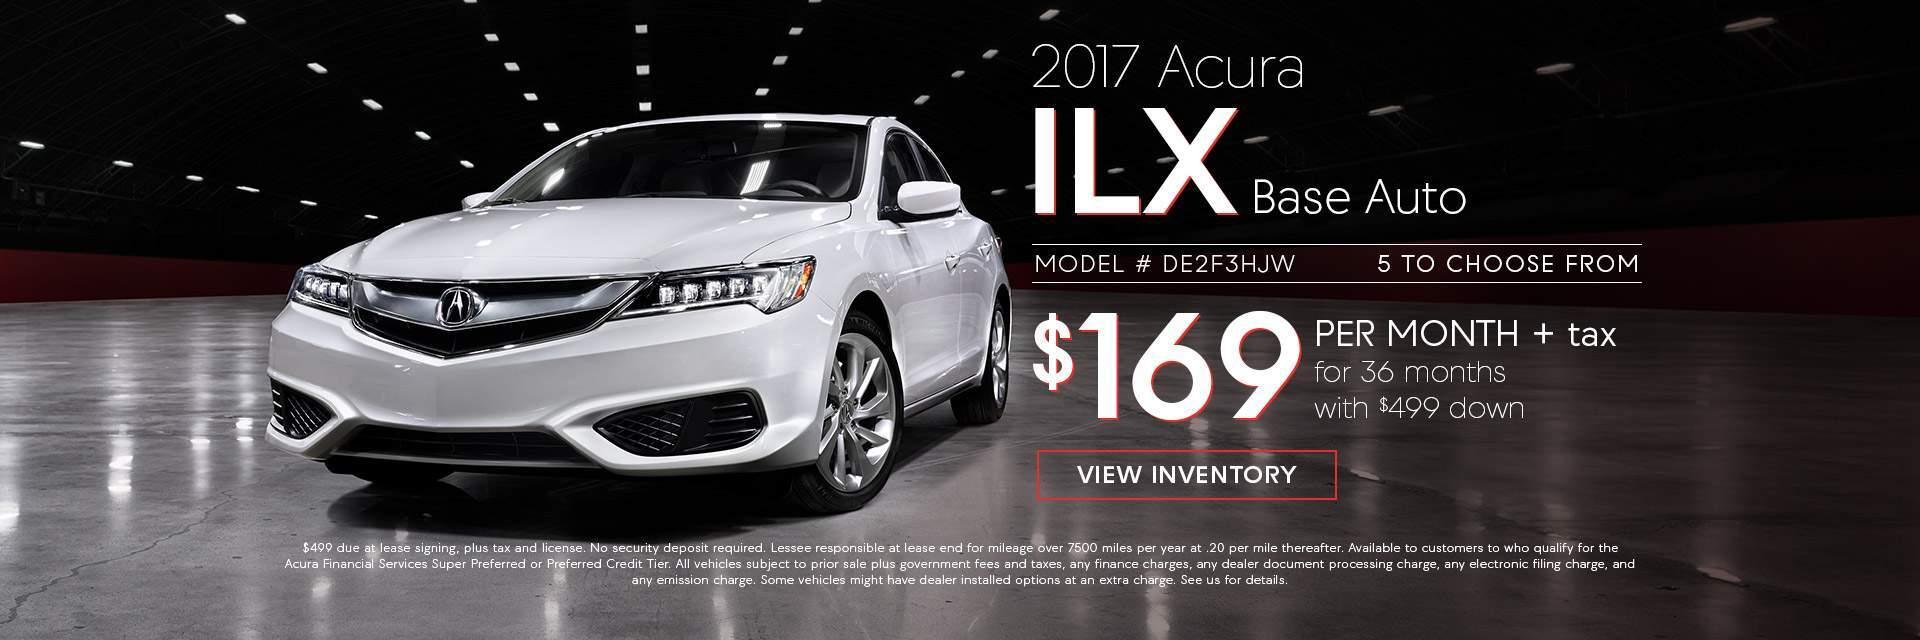 2017 Acura ILX Base